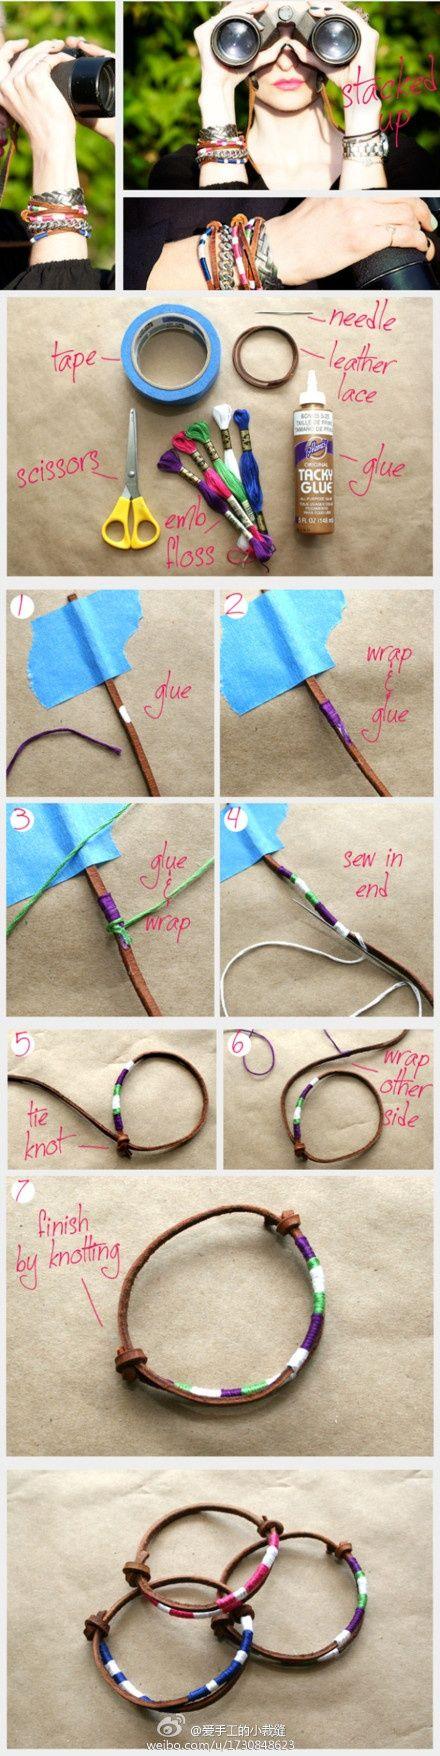 DIY - cute leather bracelet. This looks easy enough.